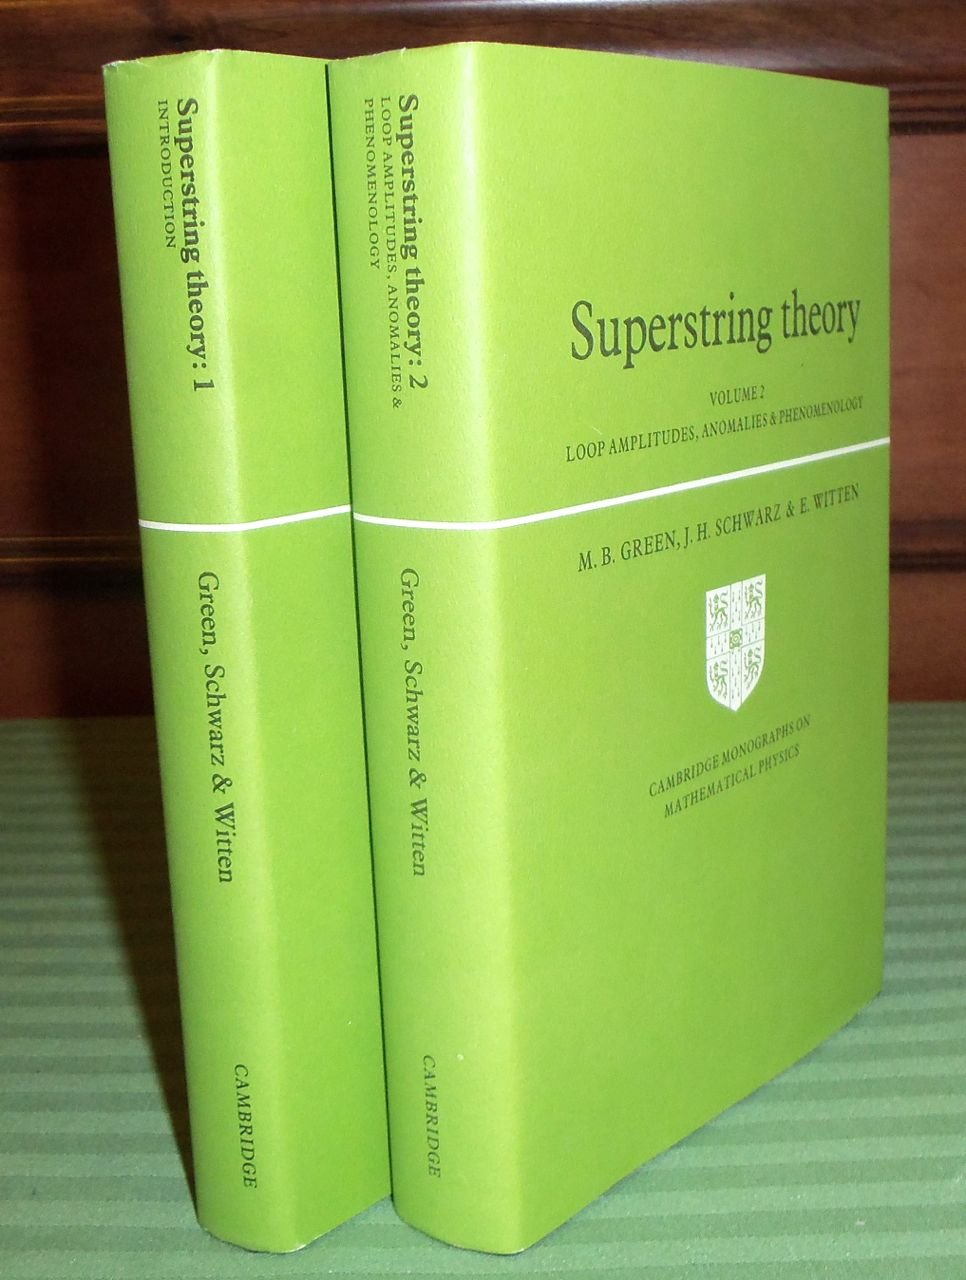 Superstring Theory: Volume 2, Loop Amplitudes, Anomalies and Phenomenology:  Loop Amplitudes, Anomalies and Phenomenology v. 2 (Cambridge Monographs on  ...